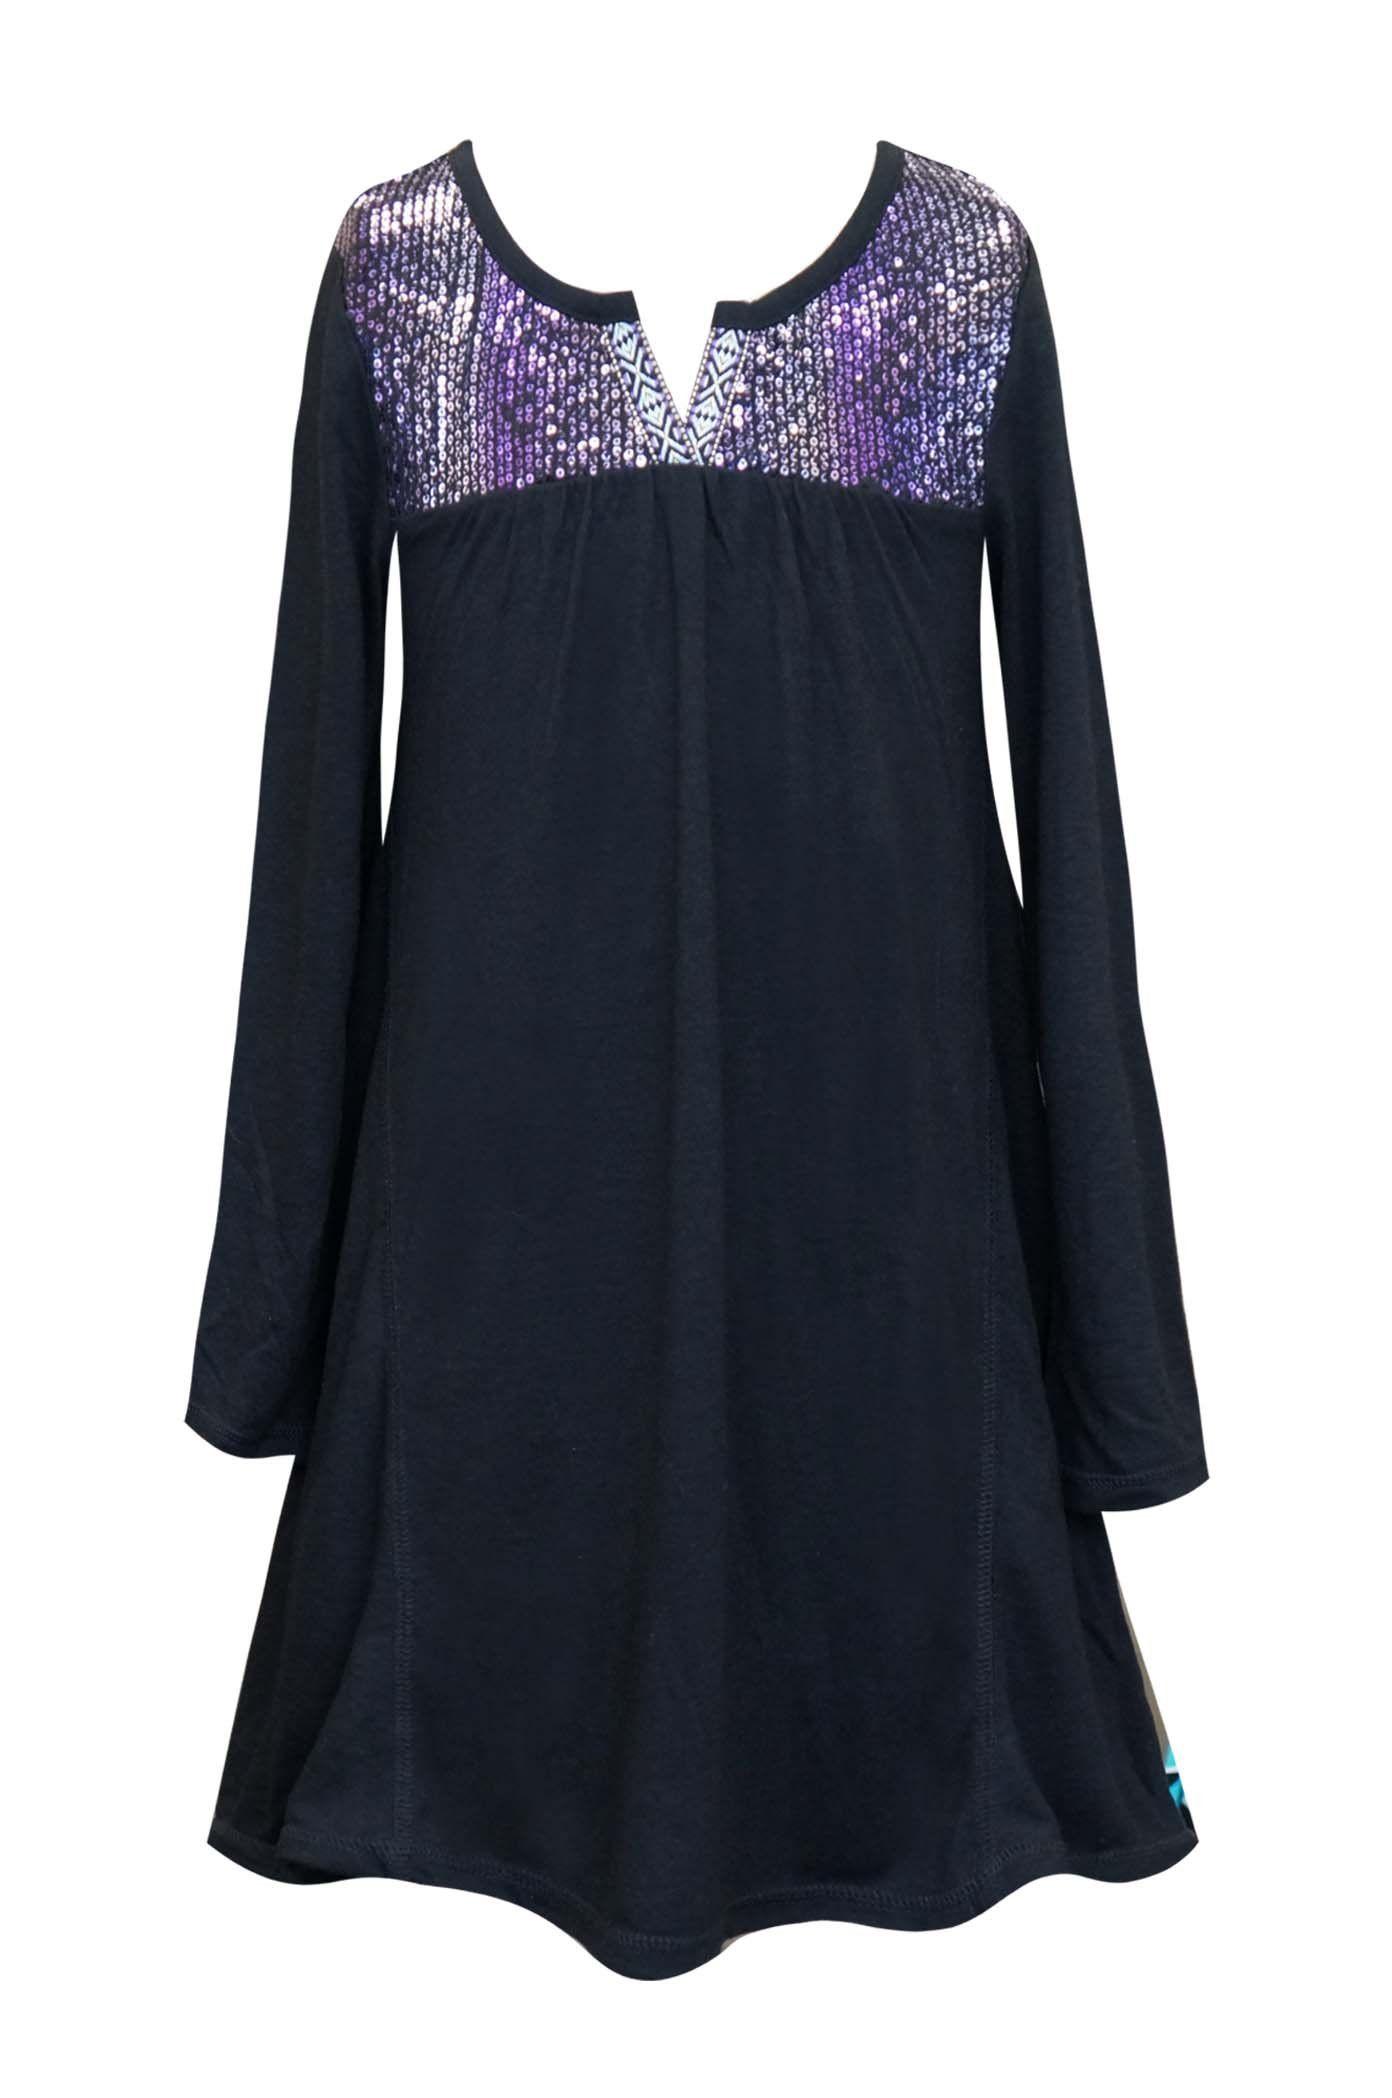 5b469500f Truly Me Big Girls Tween Ombre Sequins Yoke Long Sleeve Dress